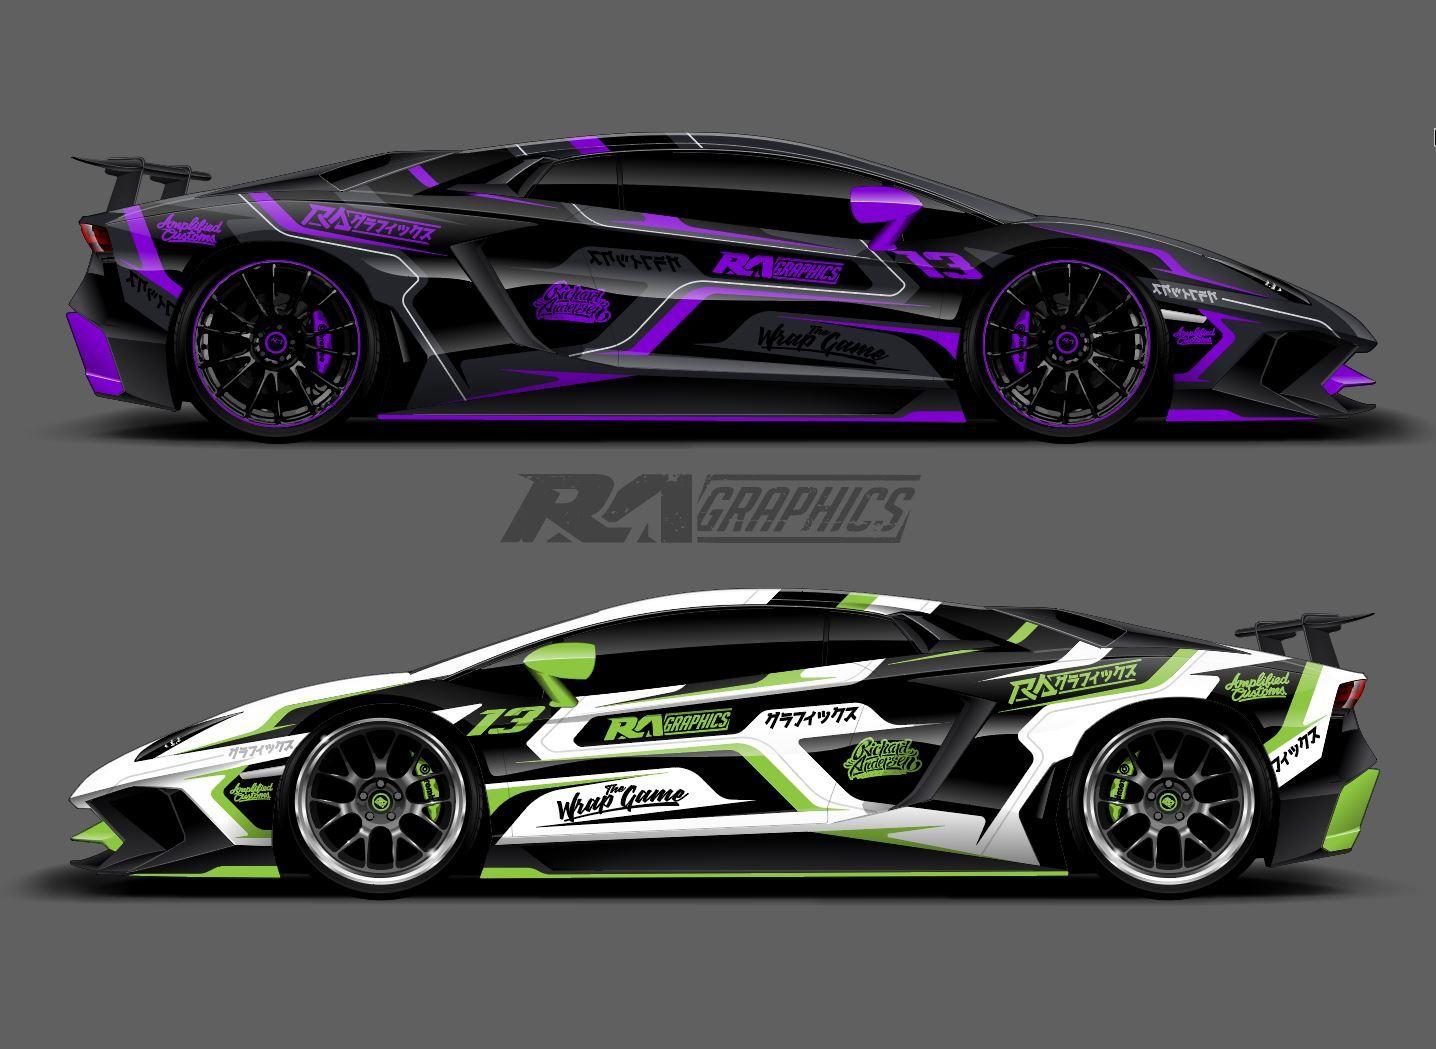 Ra Wrap Designs Lamborghini Wrap Design For Sale Please Email Us